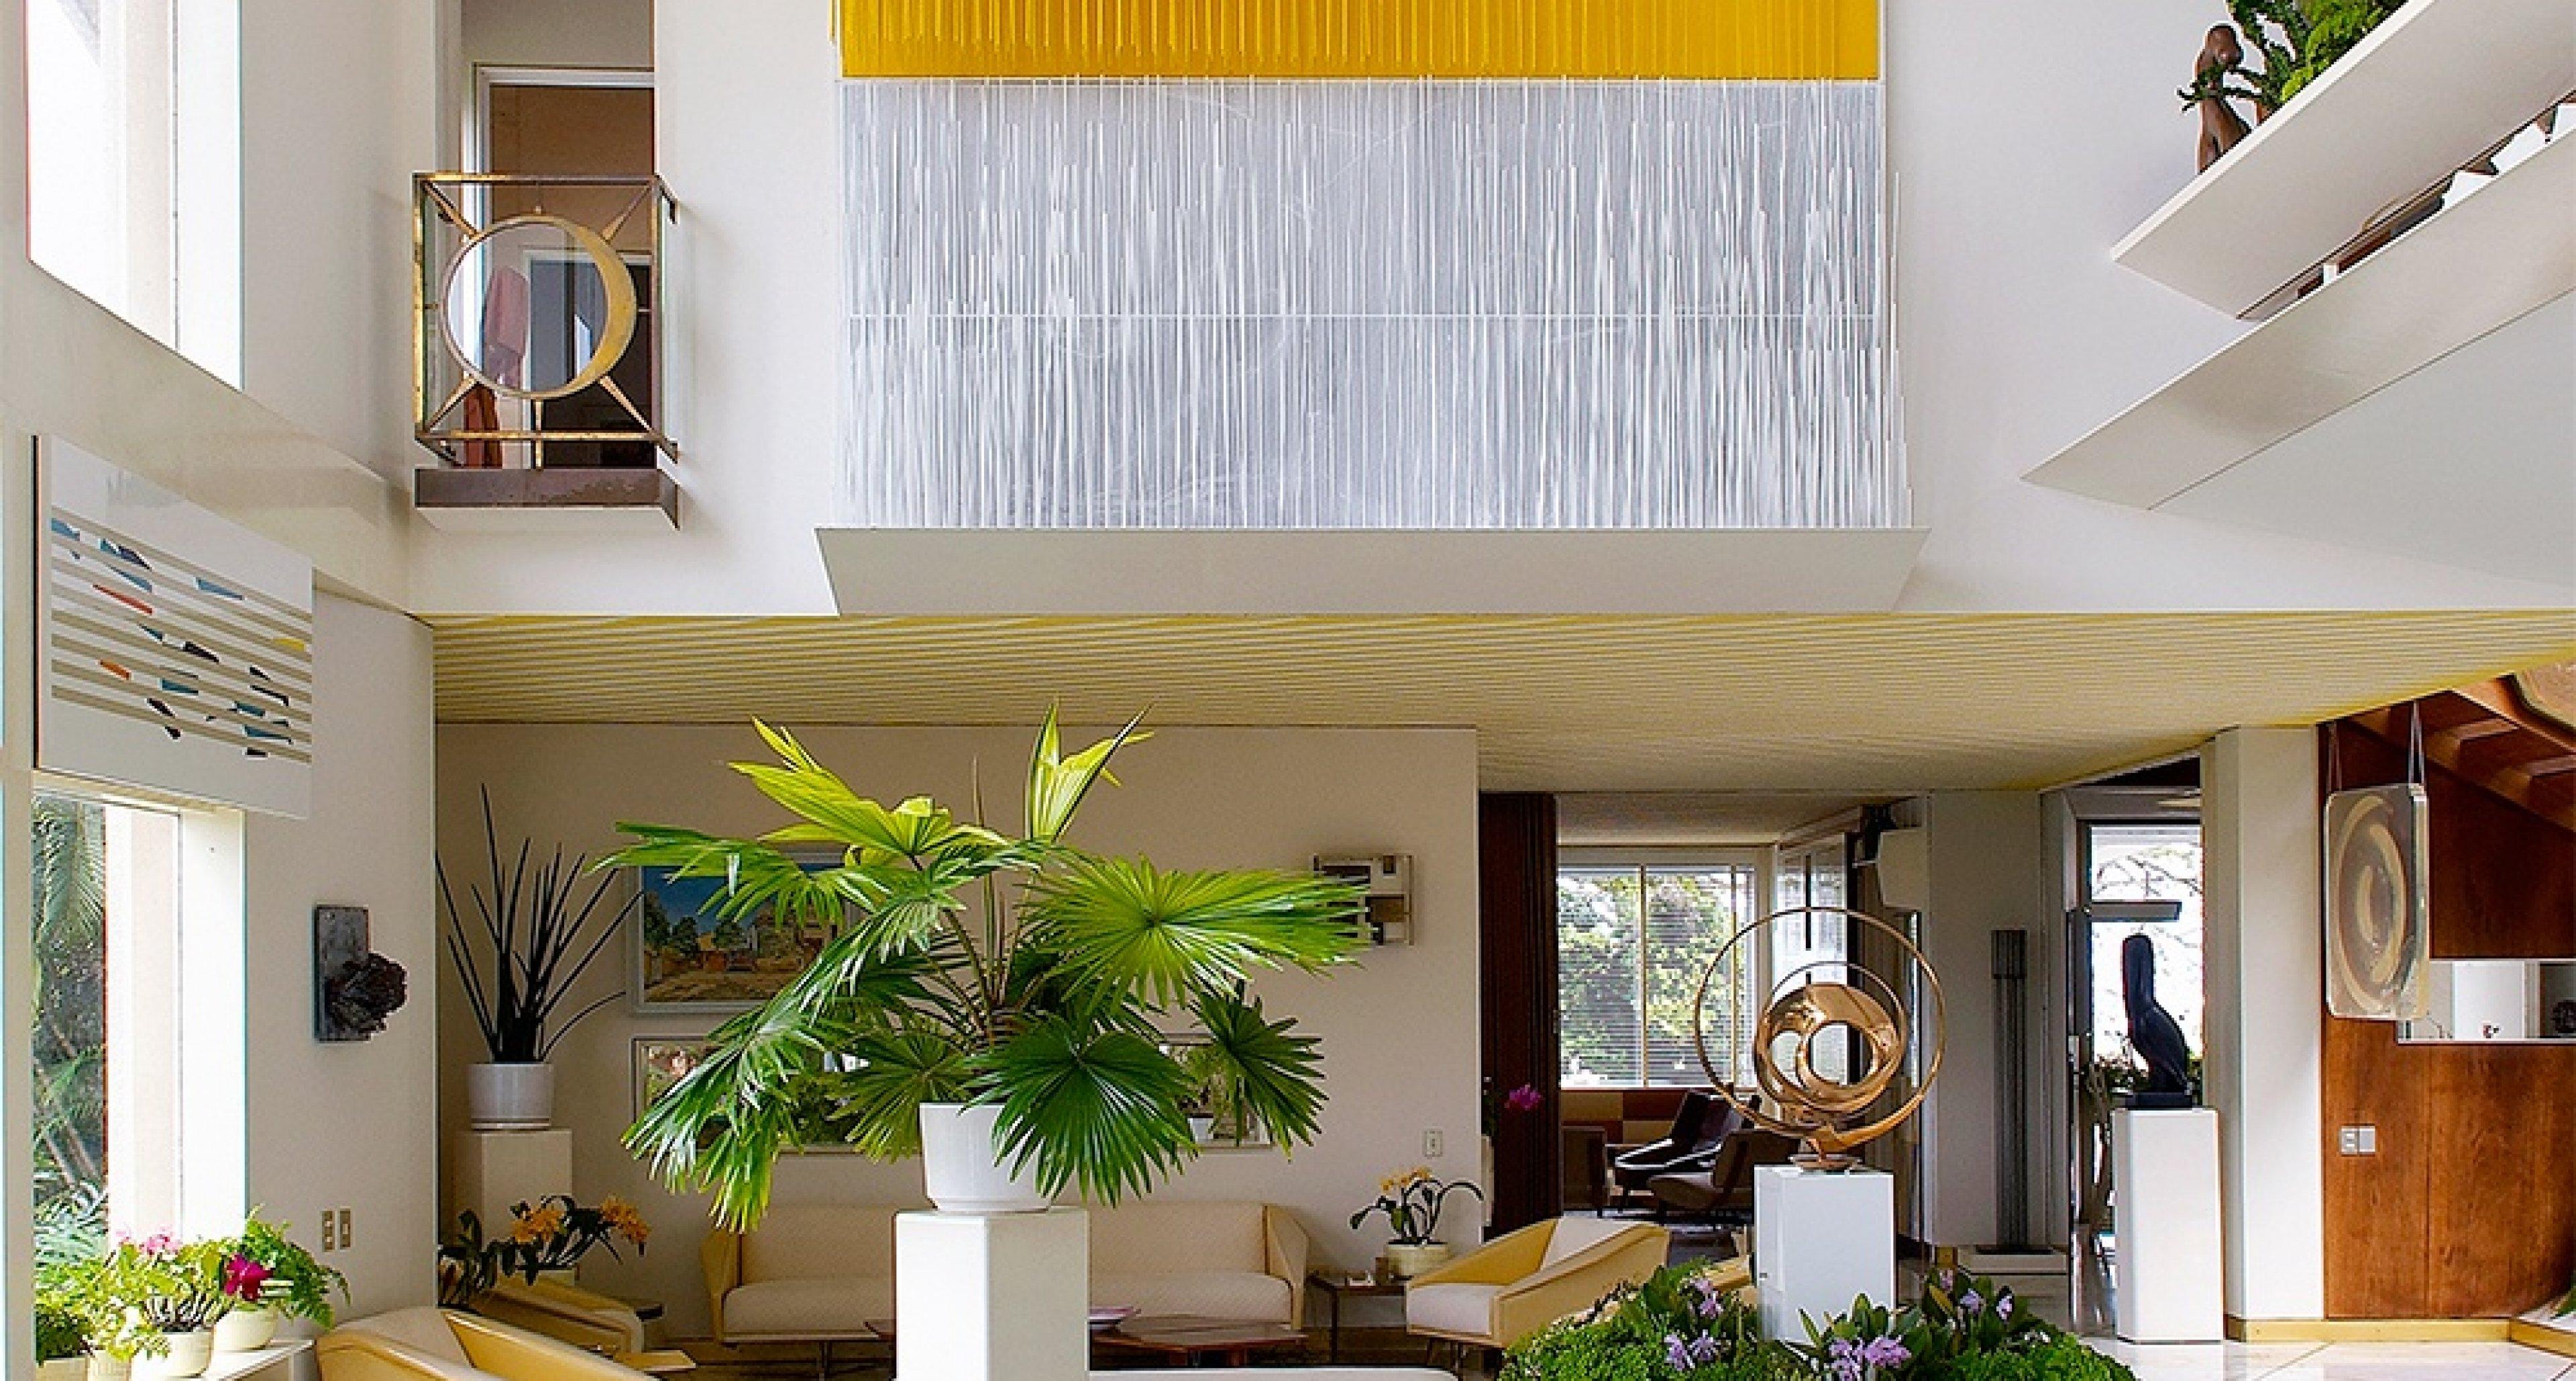 Living room, Villa planchart, Caracas — 1953-57 © Antoine Baralhé Caracas, Anala and Armando Planchart Foundation